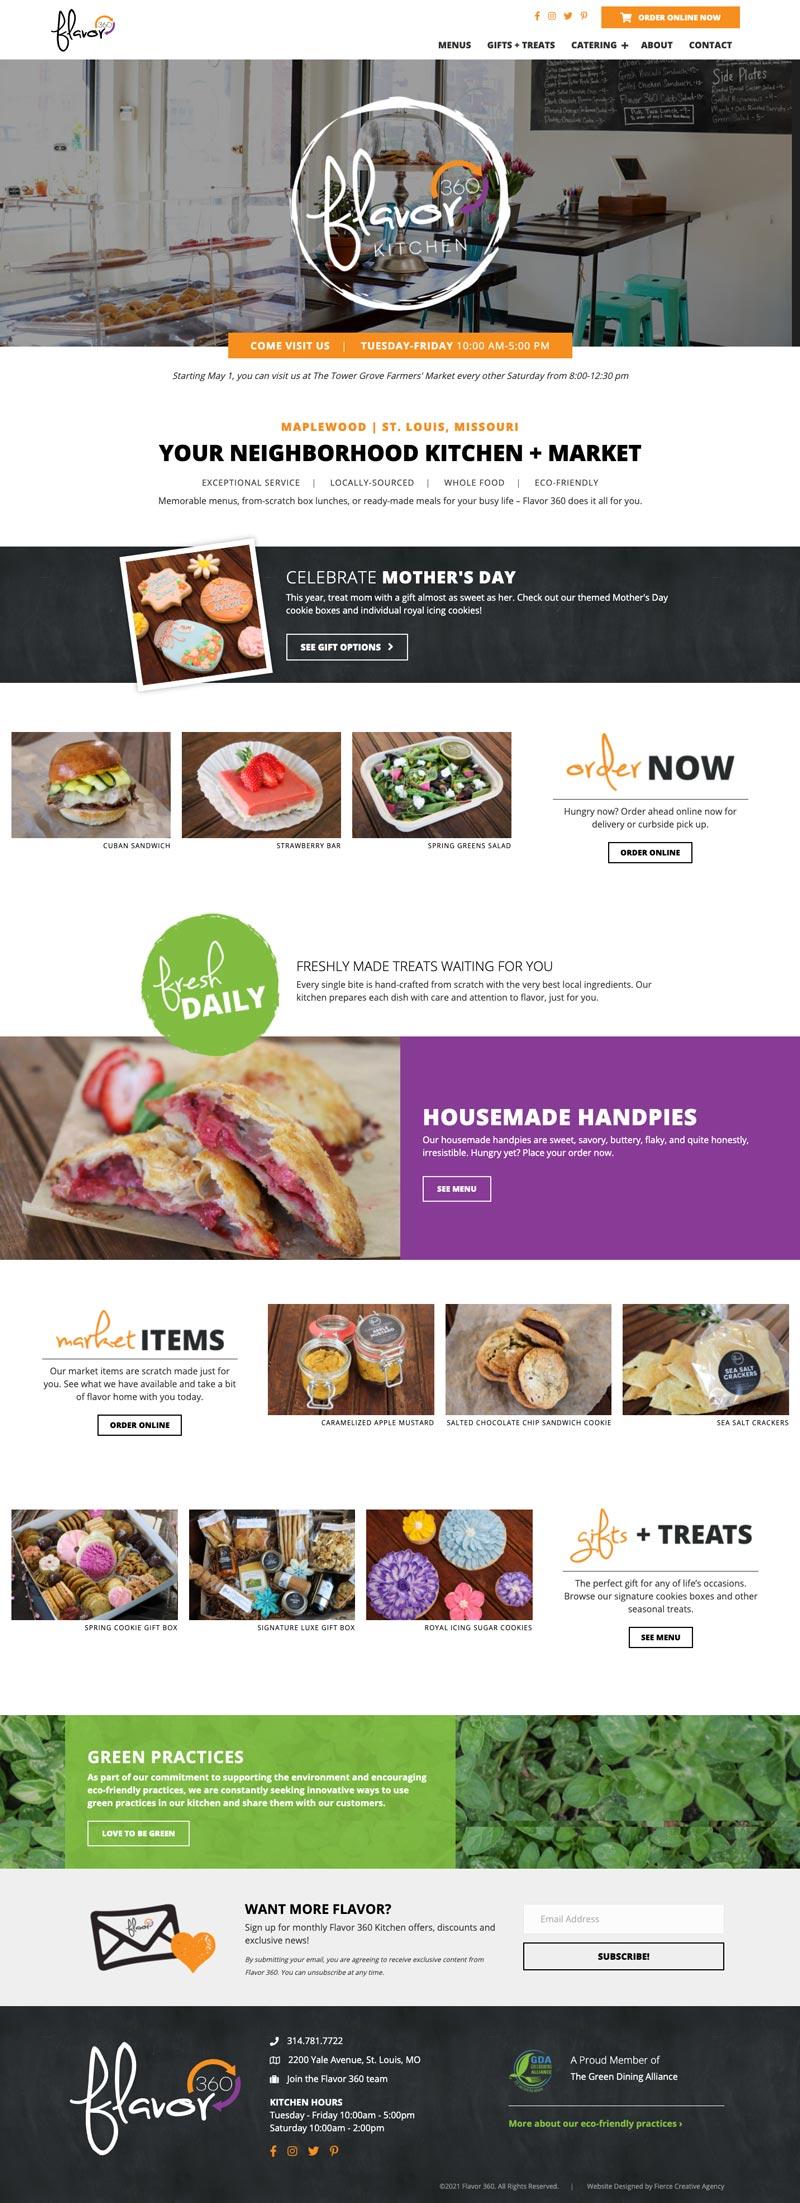 Flavor 360 Homepage